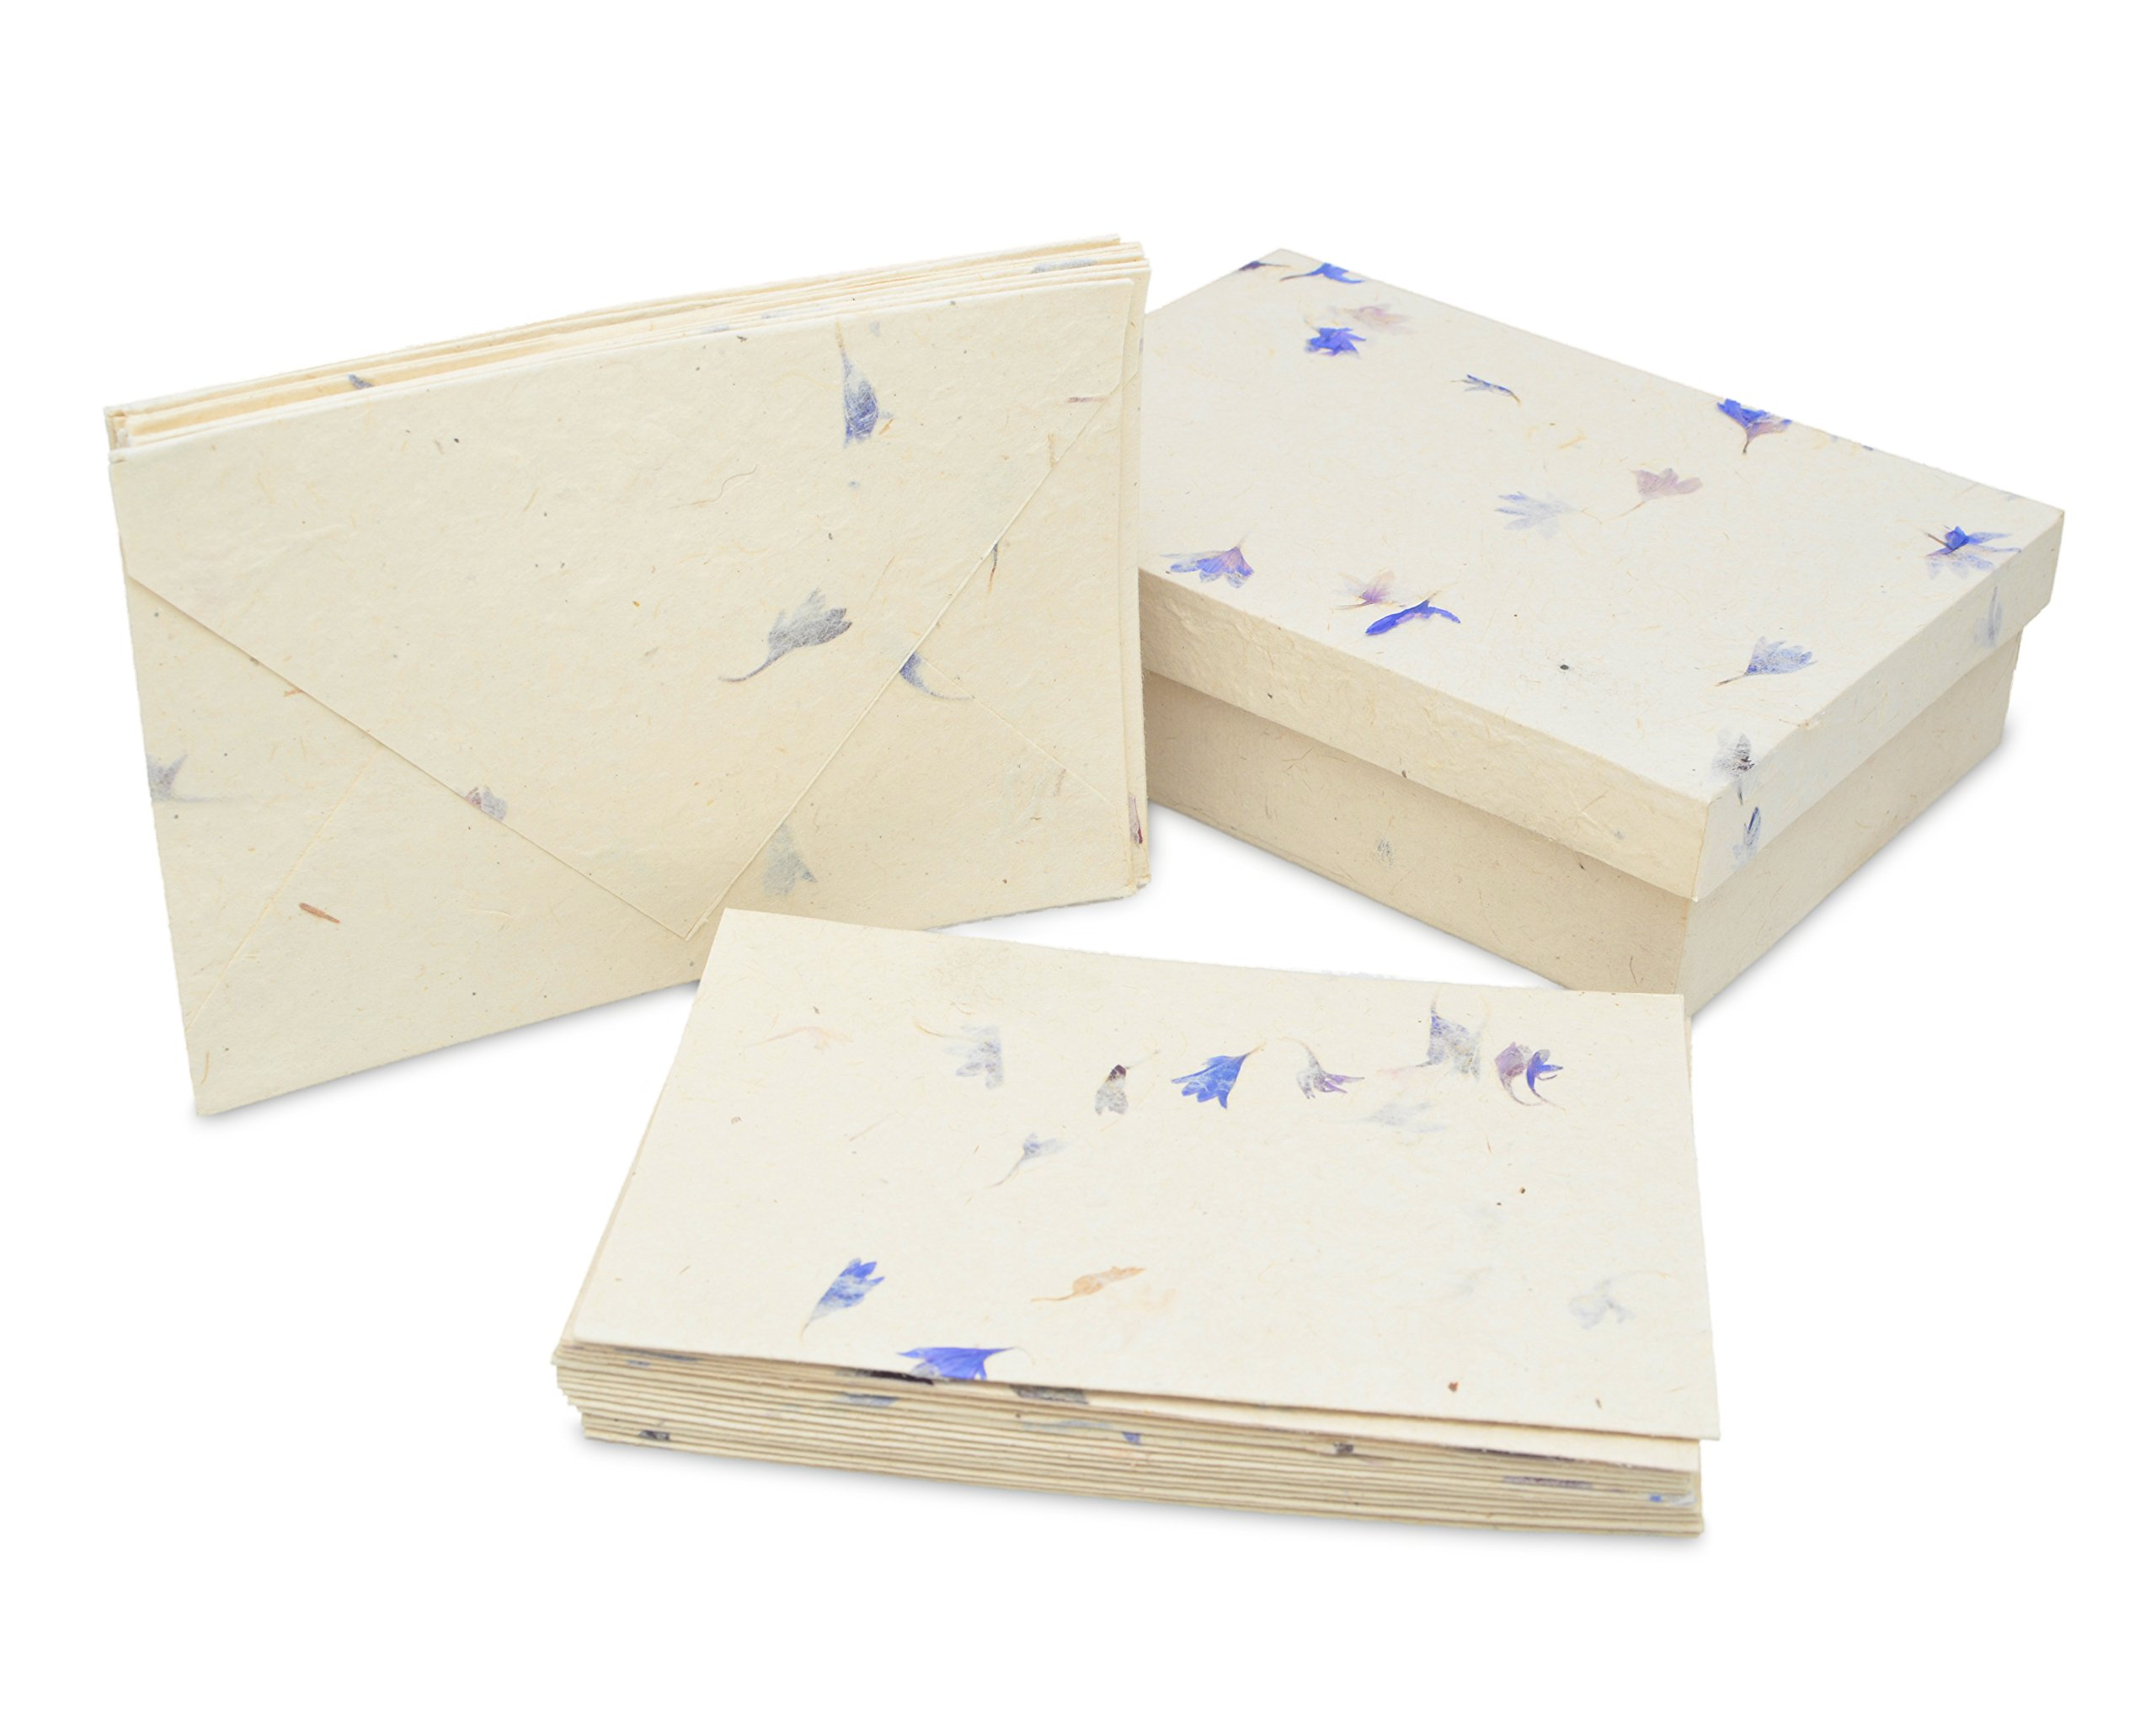 Nepali Cherish Greeting Card & Envelope Box Set with Handmade Lokta Paper from Nepal, 15 Greeting Cards (Cornflower)